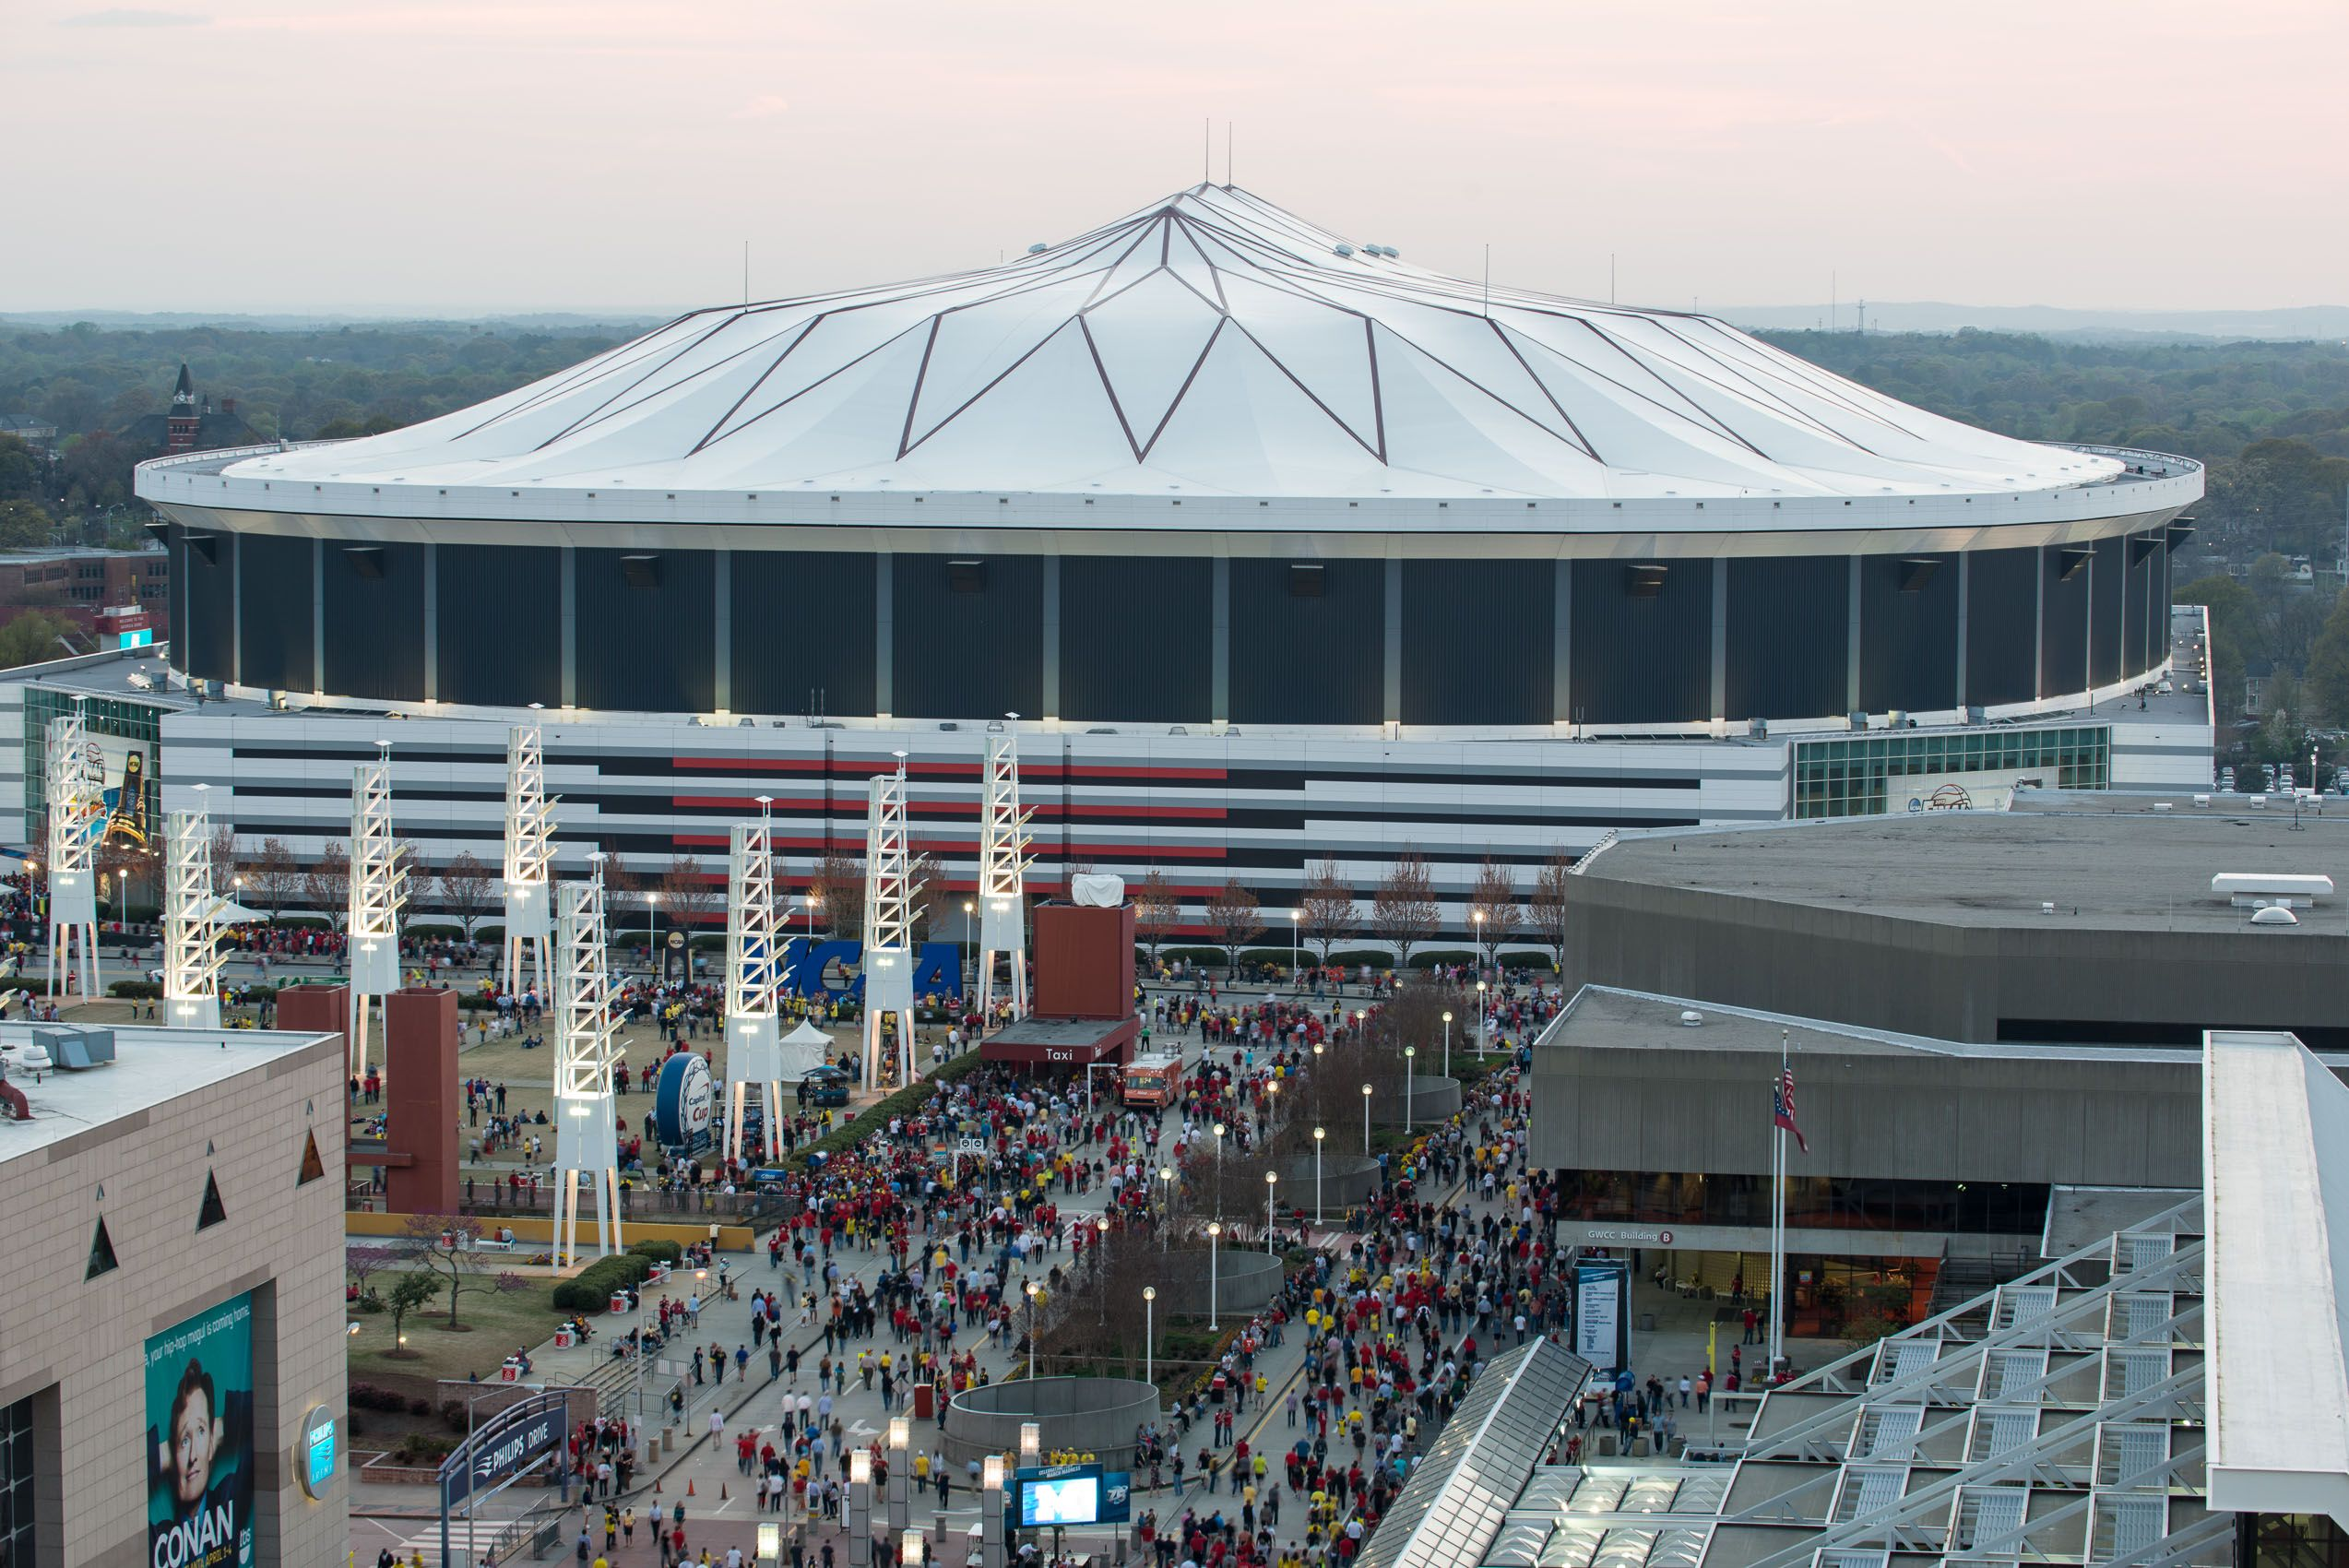 ff_stadium_exterior.jpg